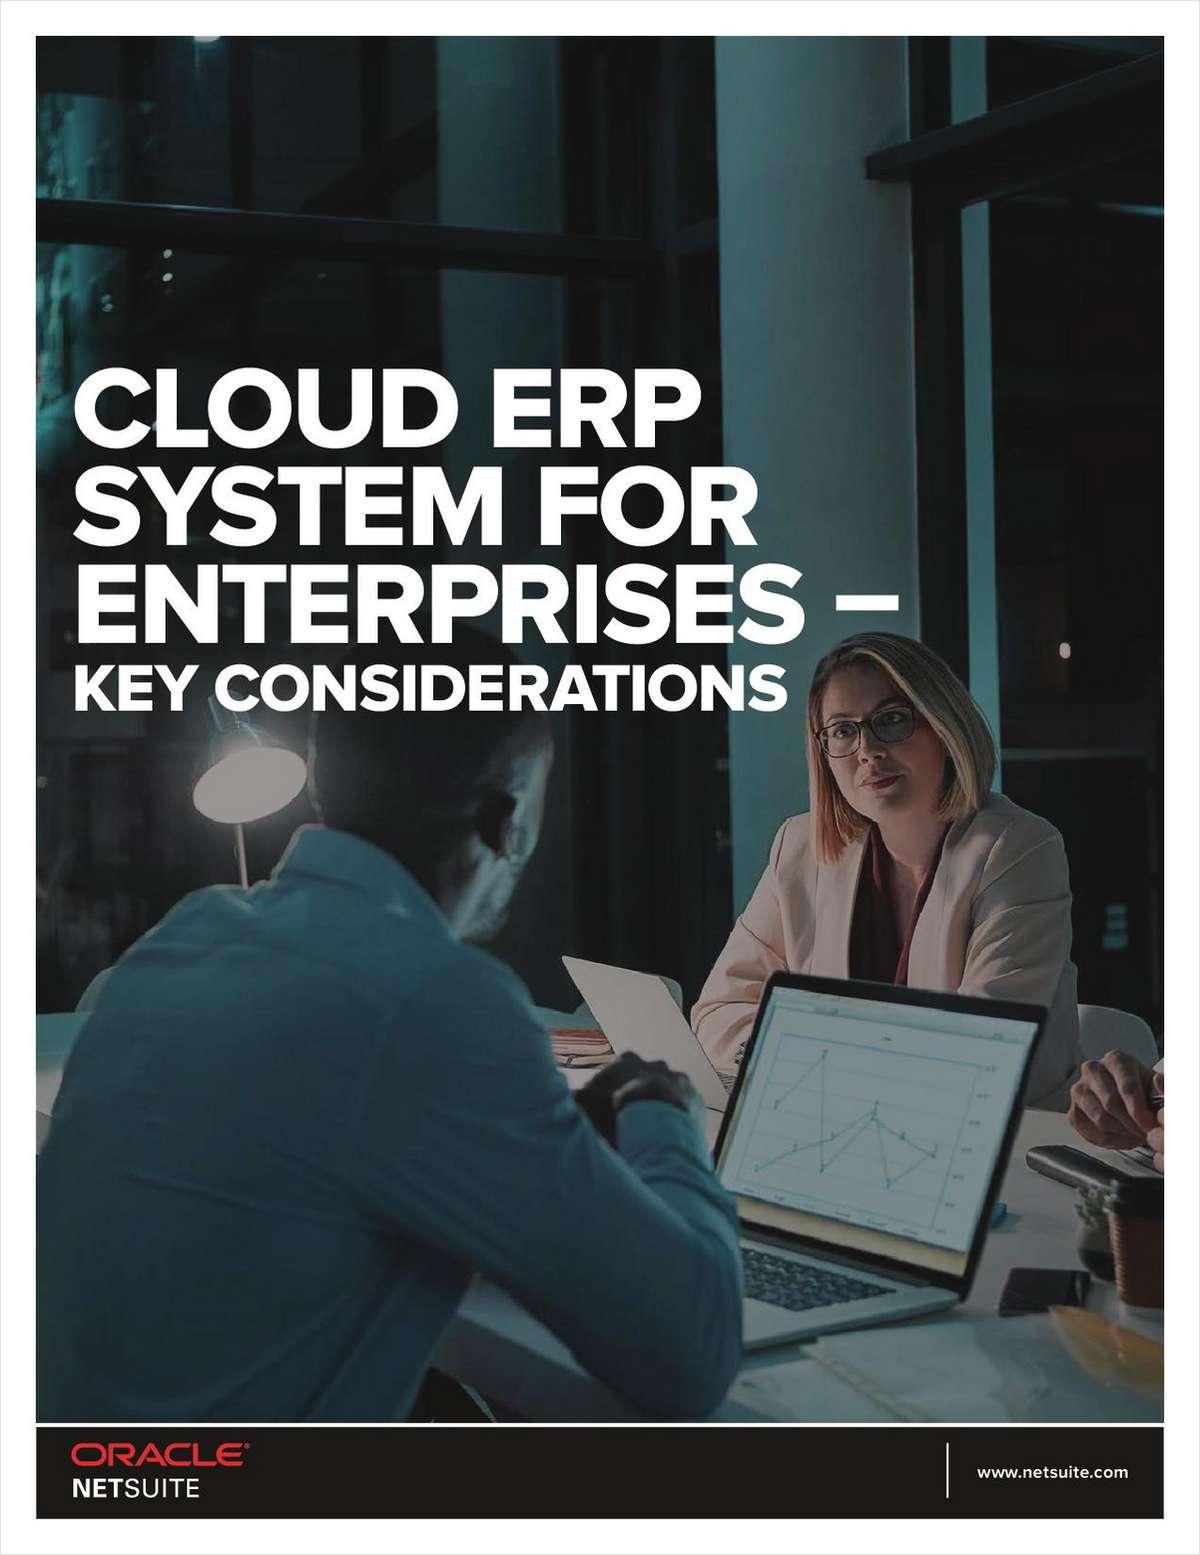 Cloud ERP System for Enterprises - Key Considerations